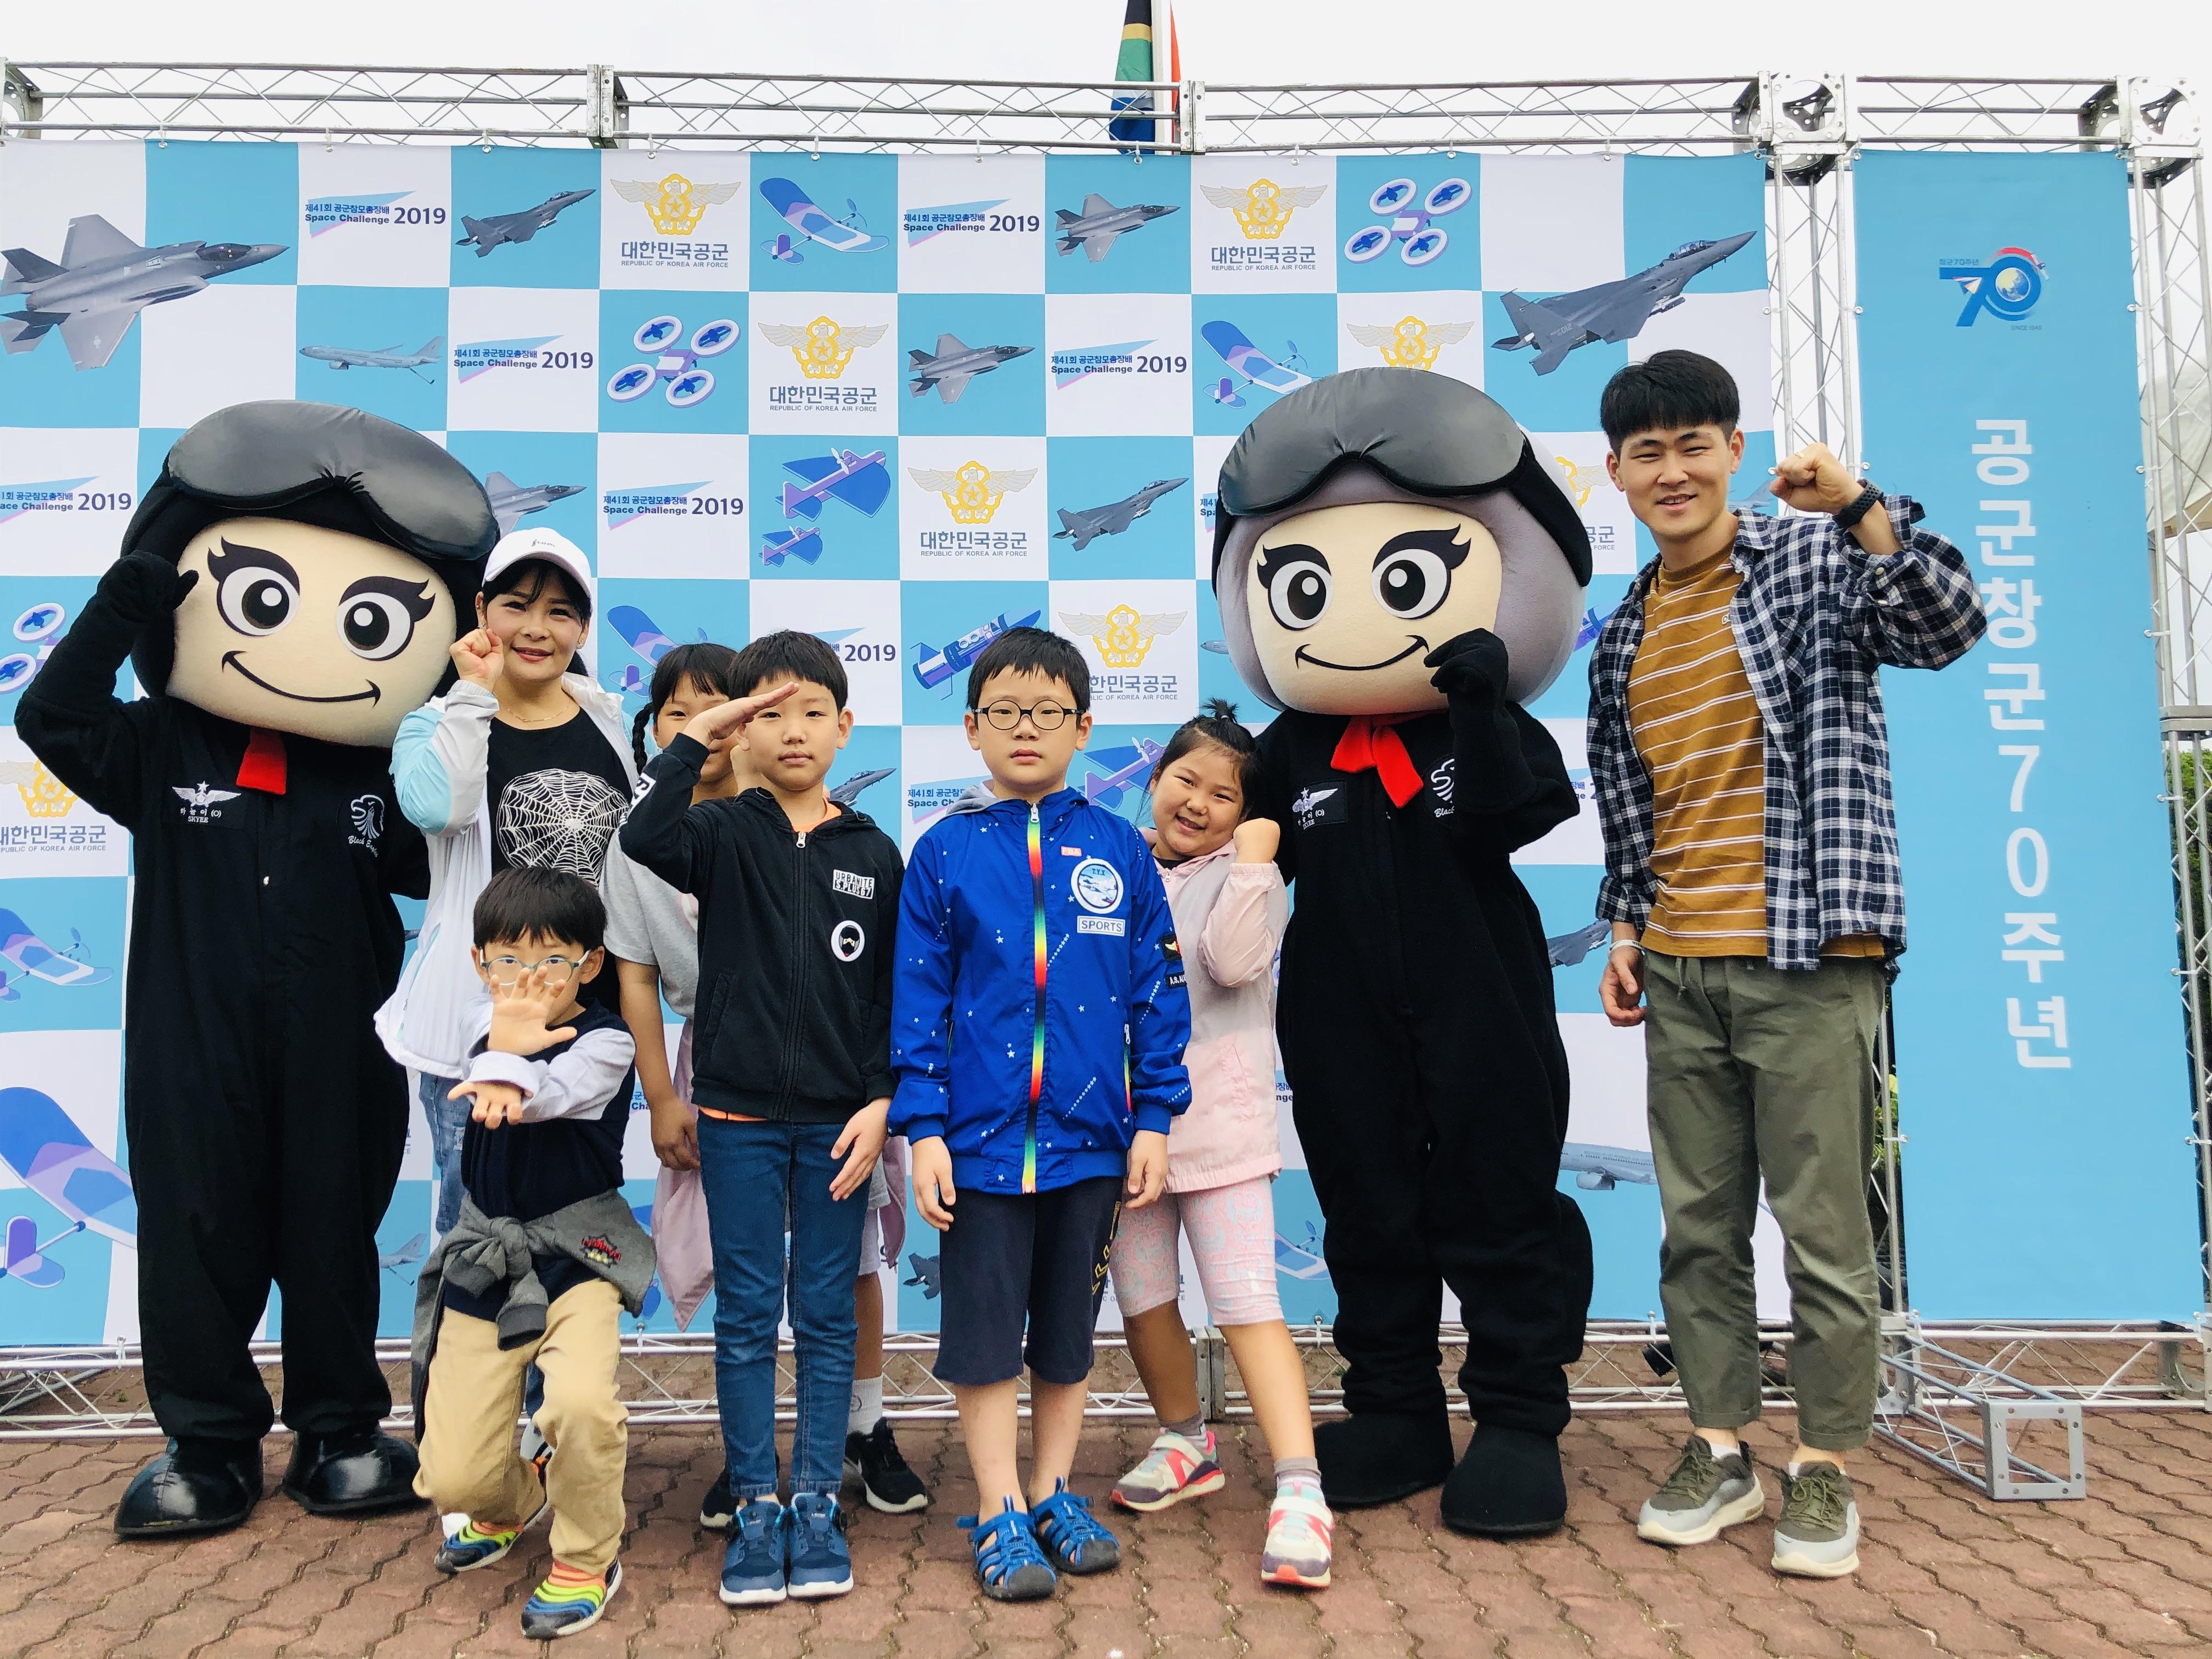 KakaoTalk_Photo_2019-09-22-16-05-16.jpeg